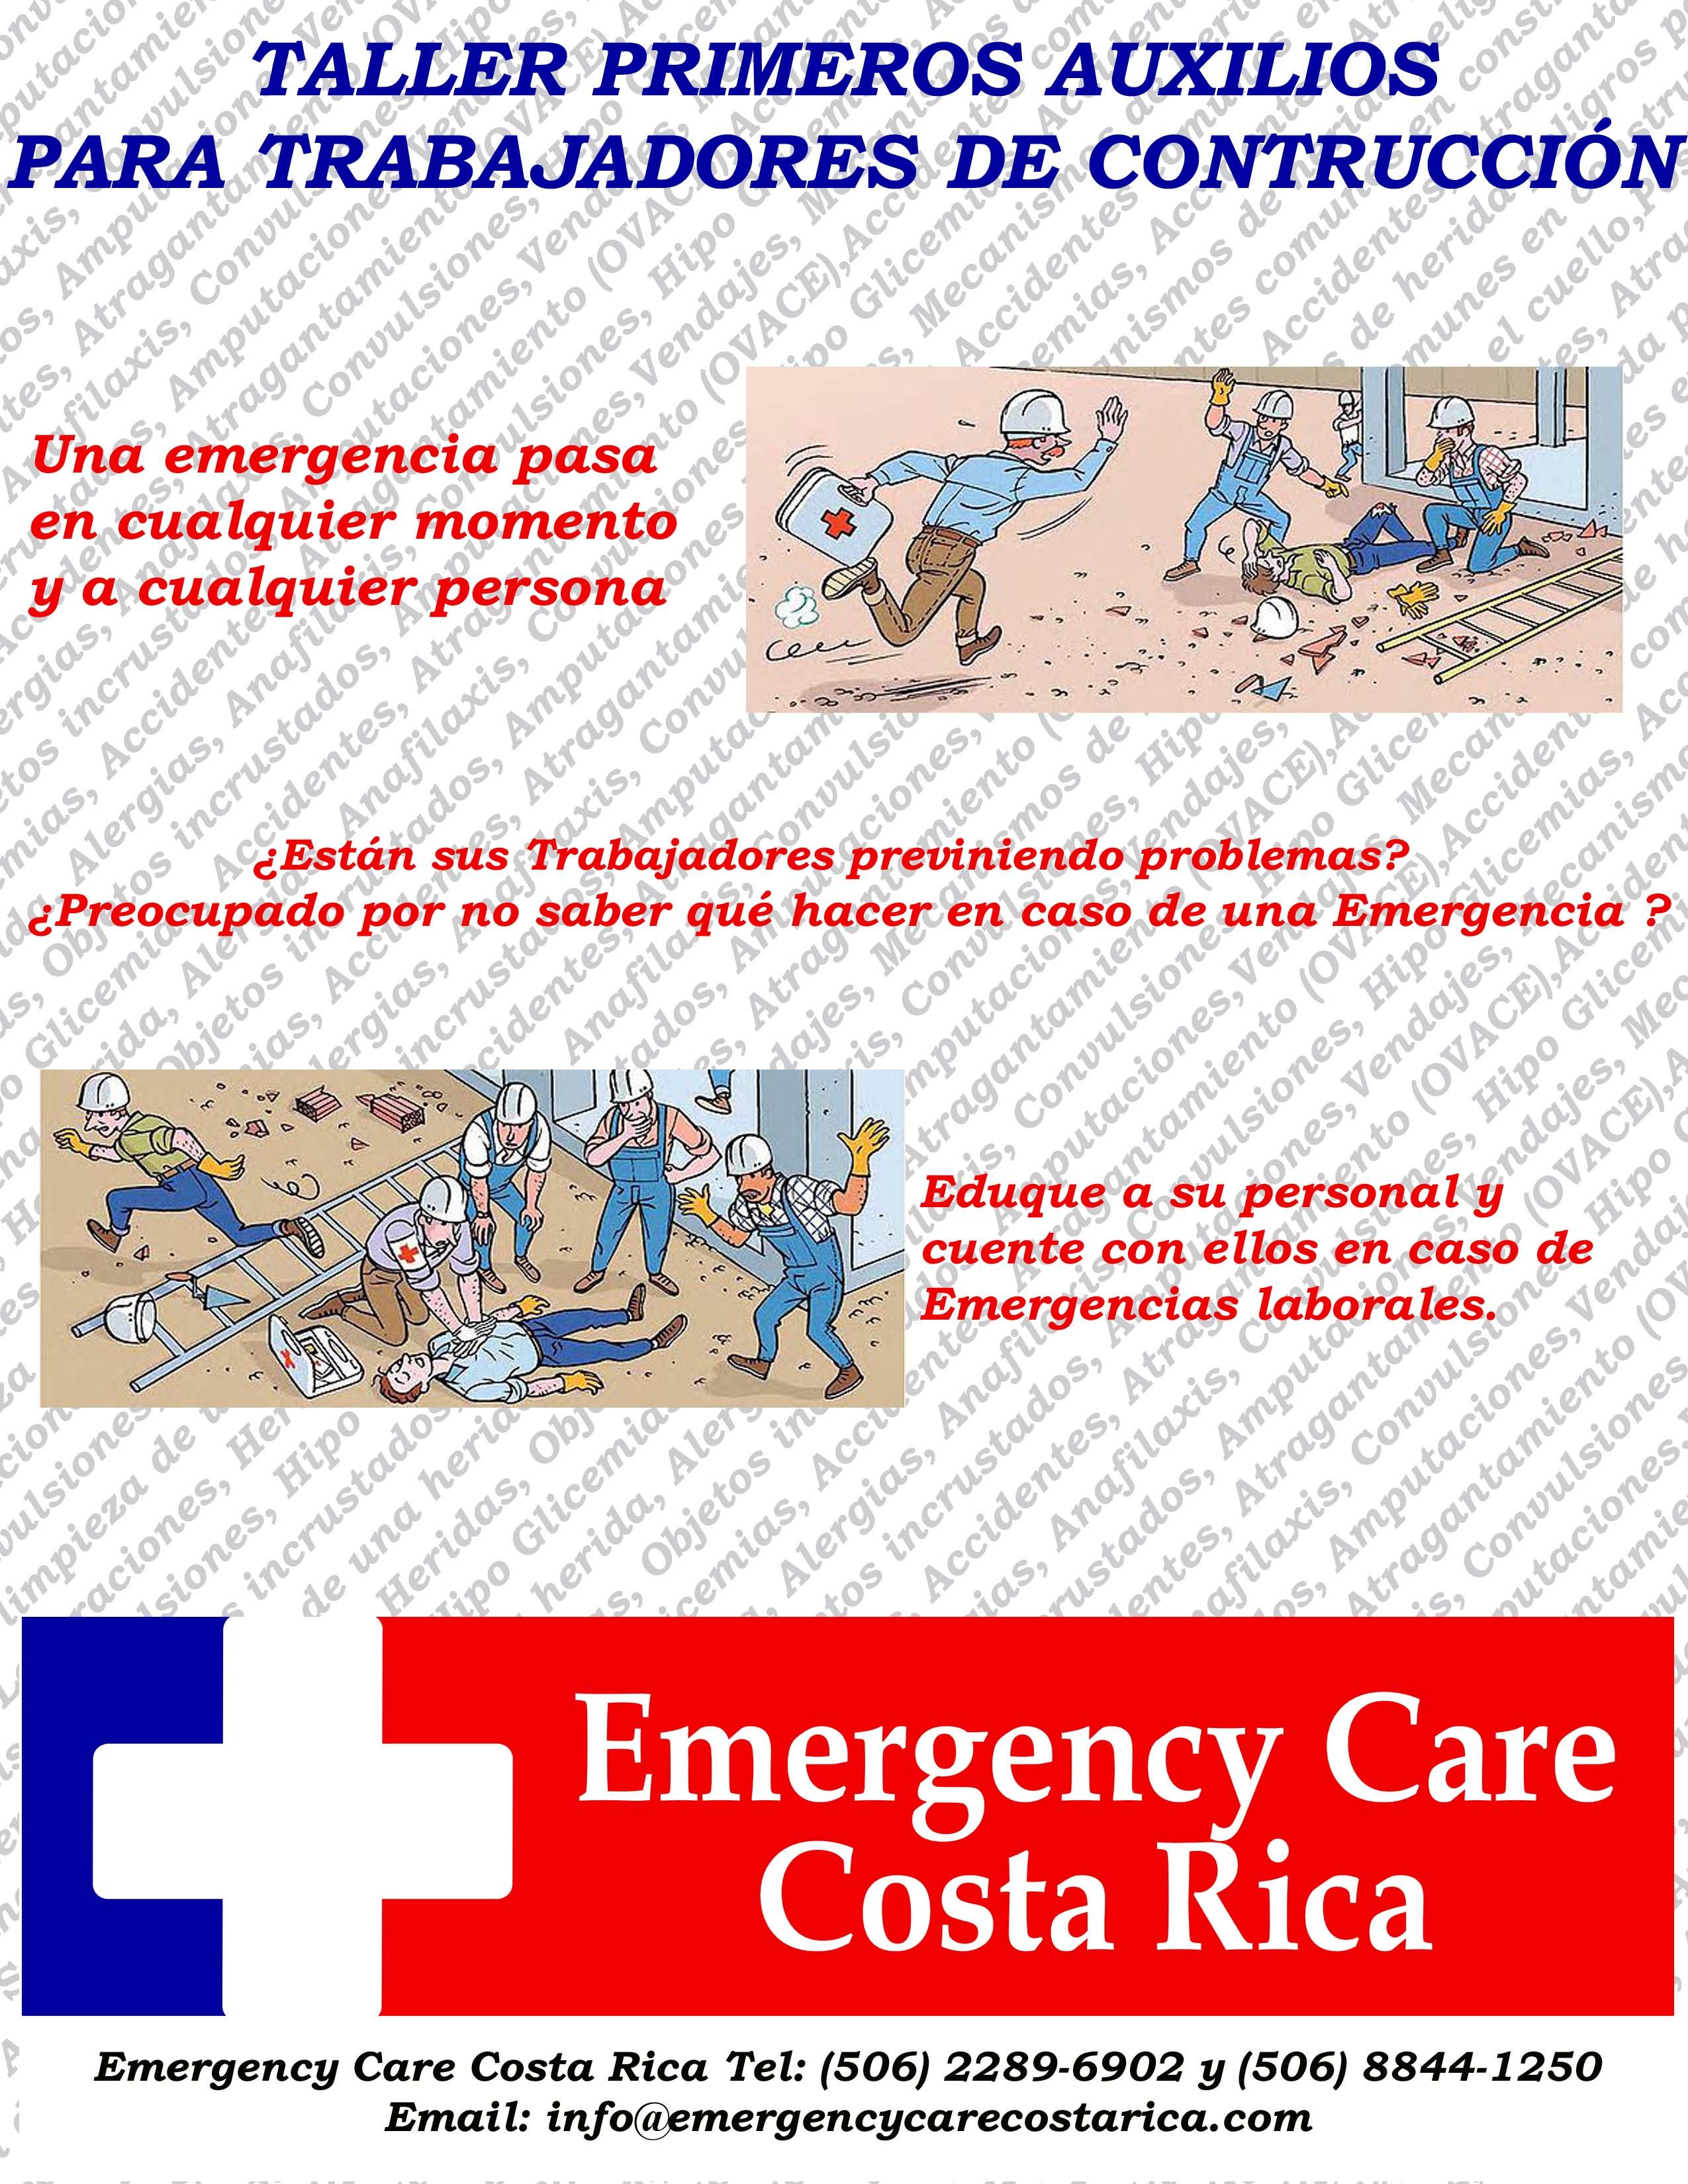 Primeros Auxilios y RCP   Emergency Care Costa Rica   Page 2